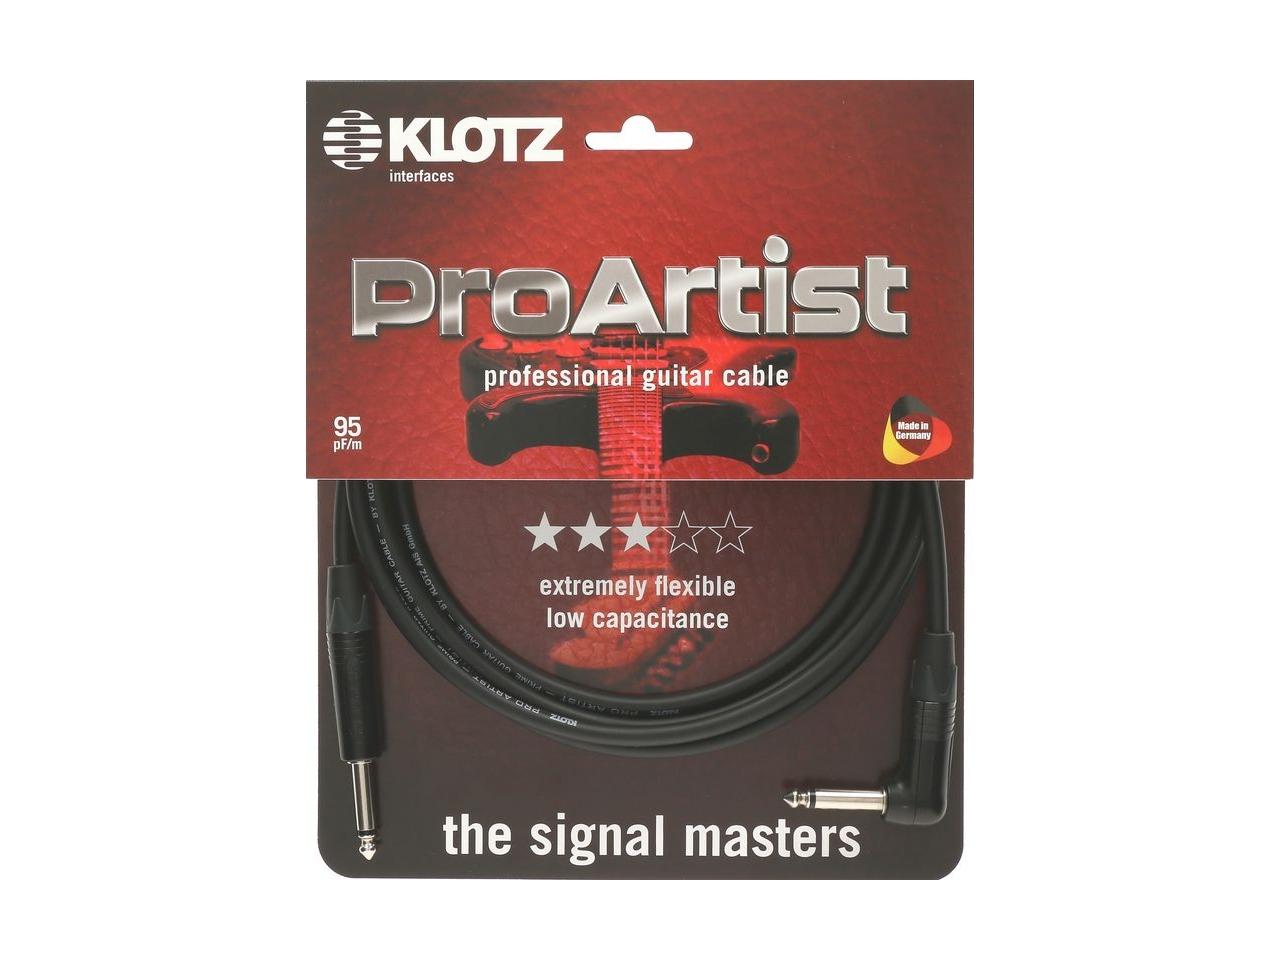 Klotz PRO ARTIST Instrumentenkabel Winkelstecker 9m